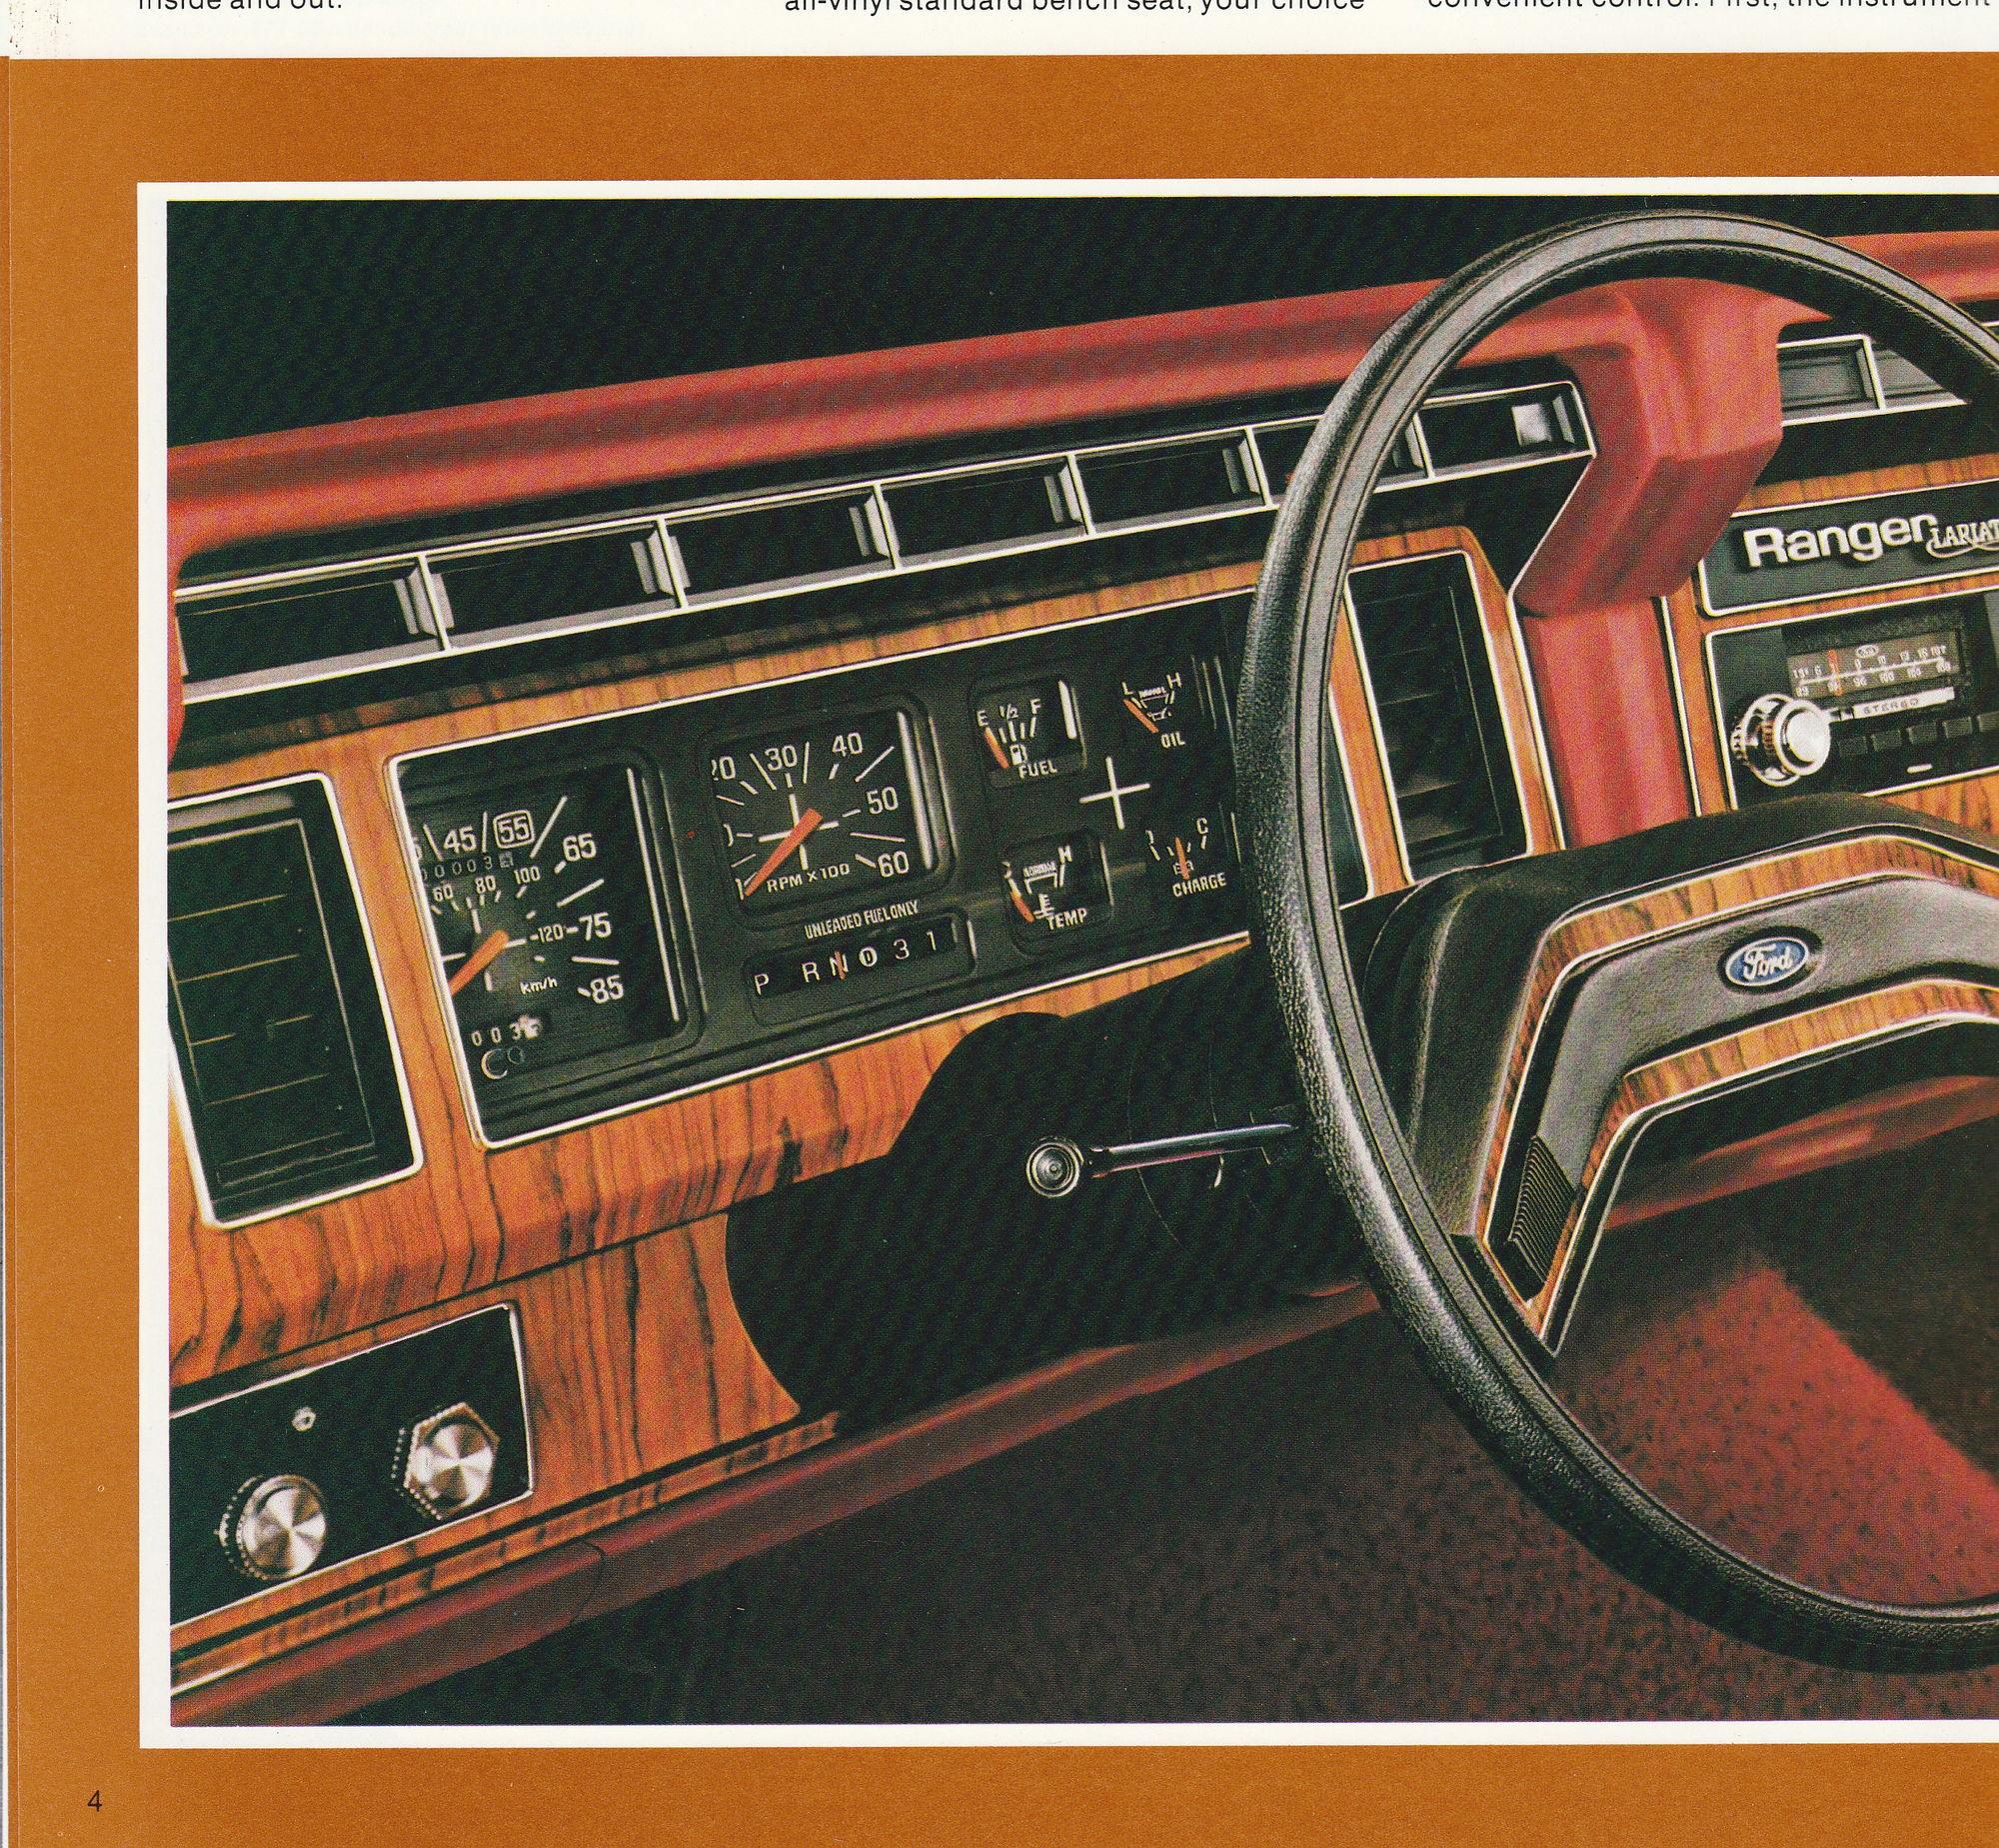 Ford F800 Alternator Wiring Diagram Smart Diagrams 1993 F600 81 Wheels 1987 1964 Parts